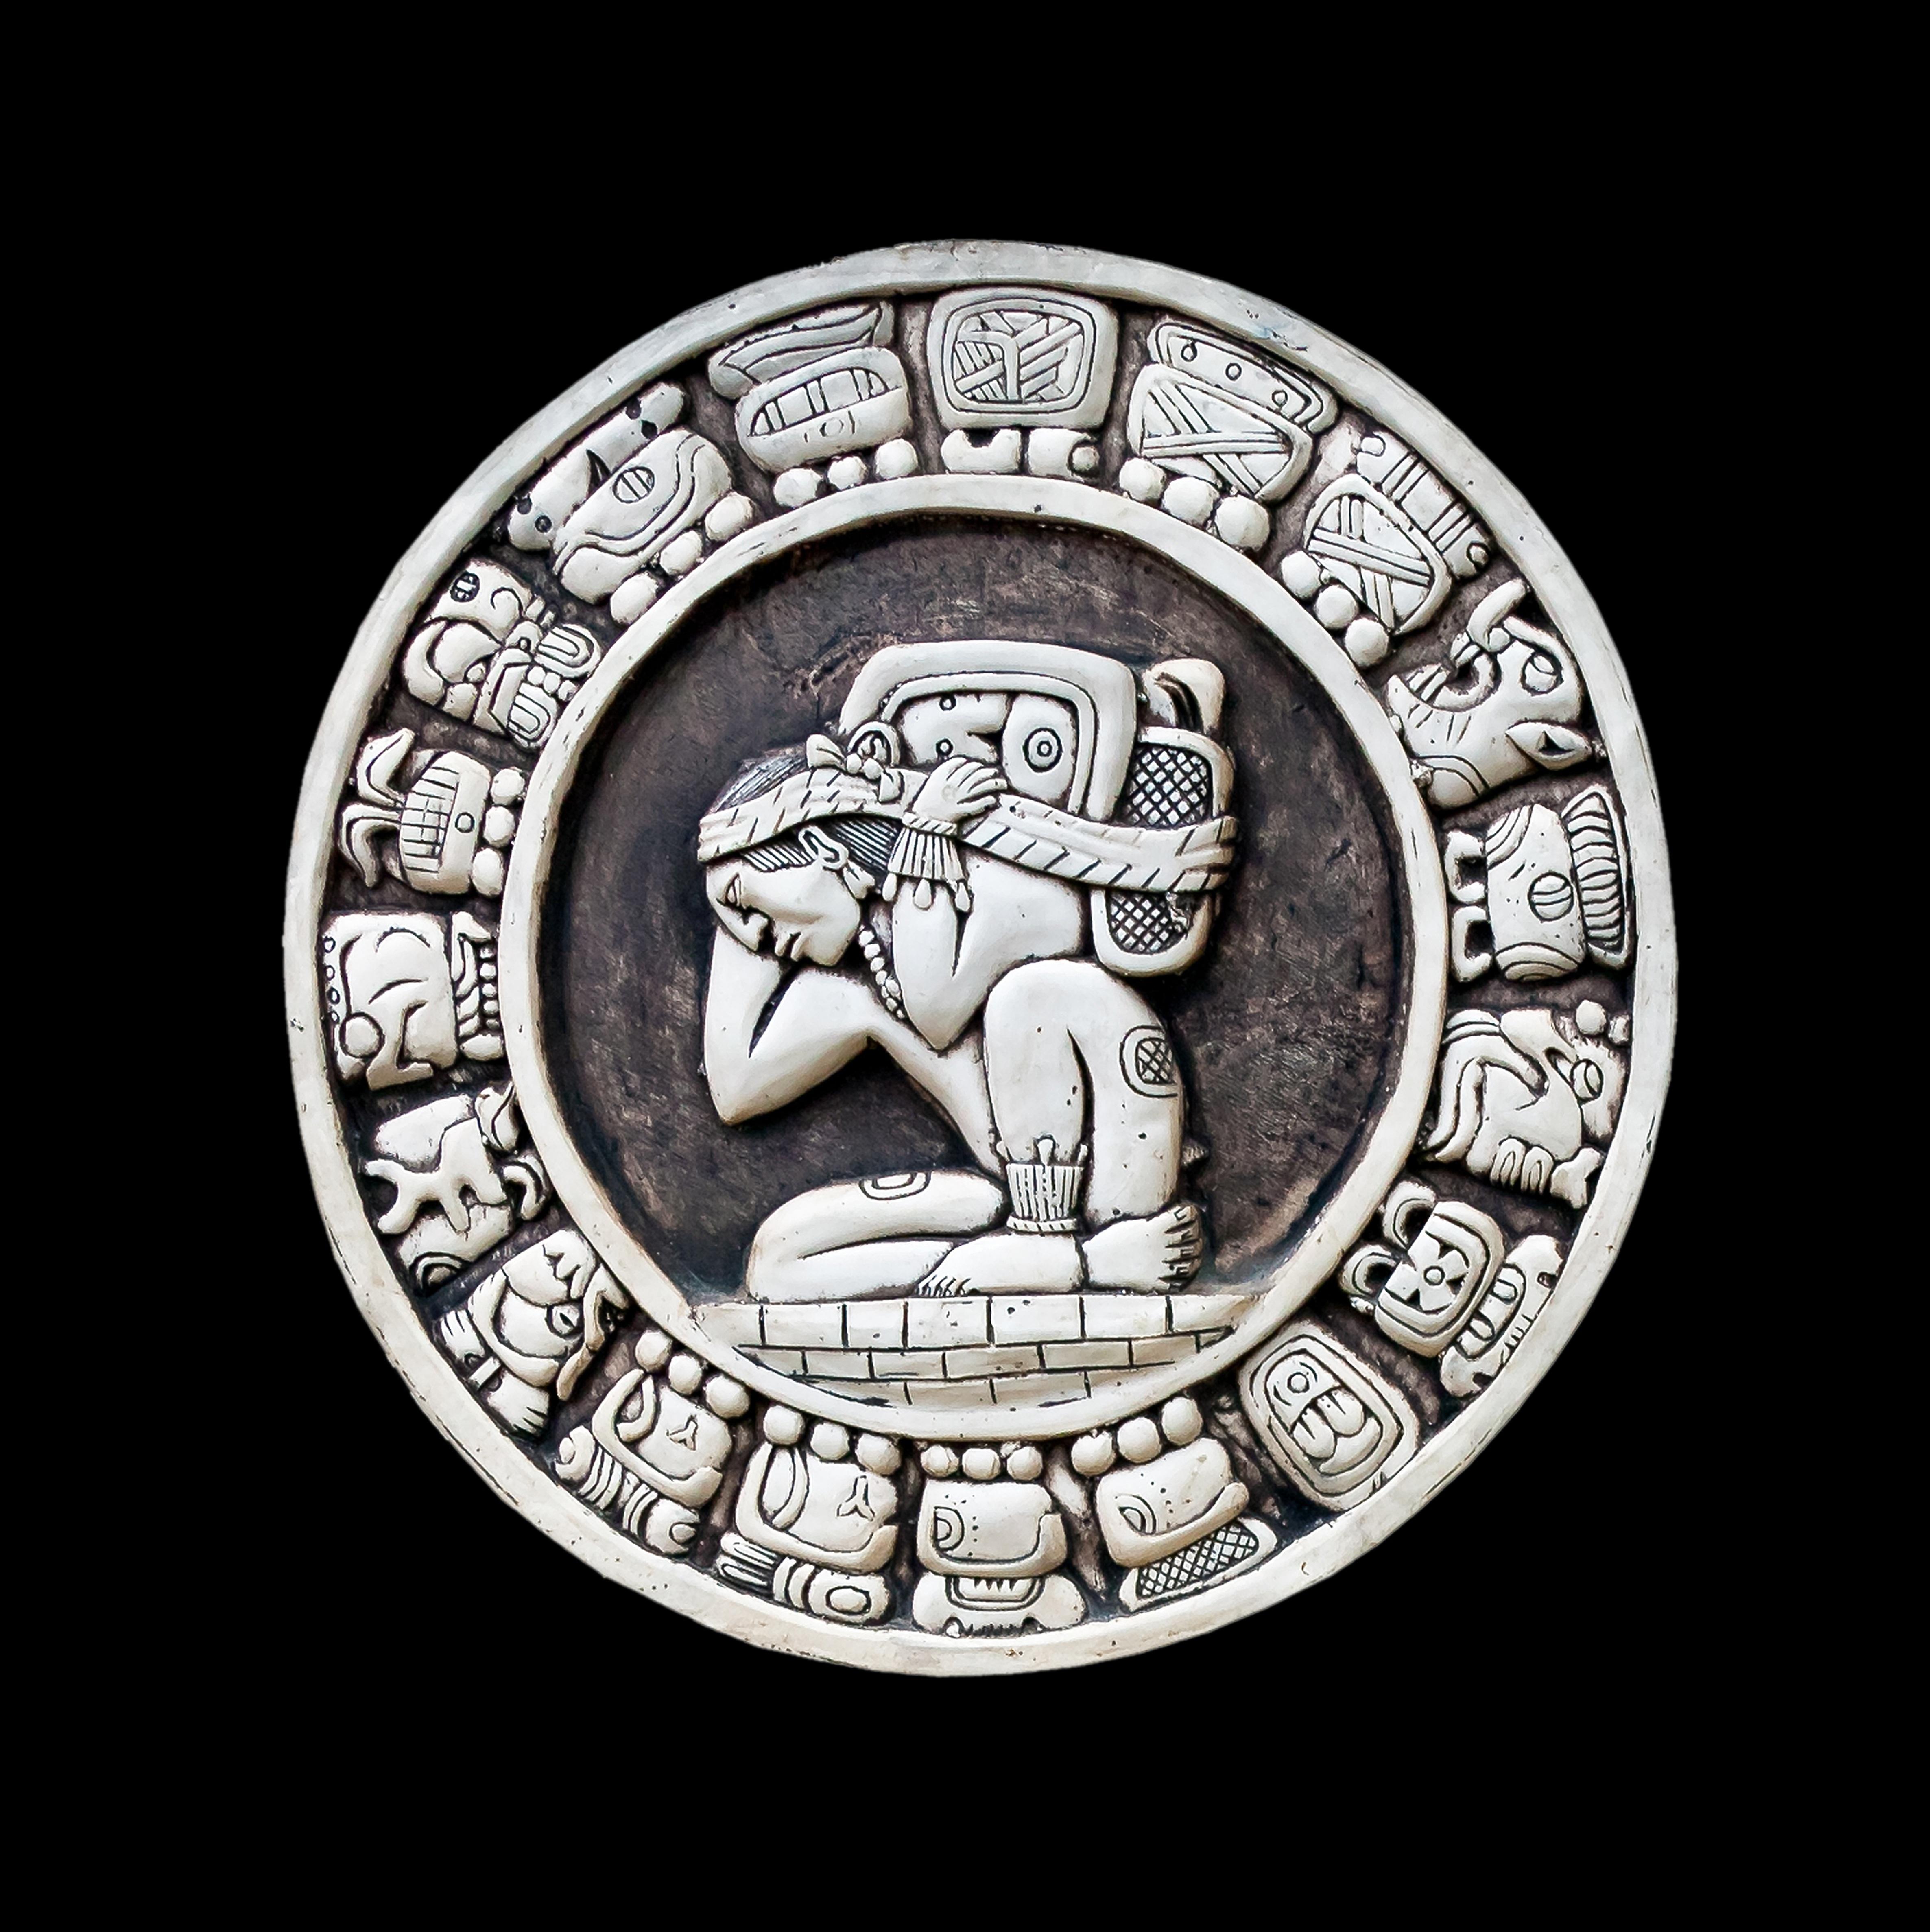 a228a2b4 Bildet : mønster, metall, penger, dekor, sølv, valuta, motiv, servise,  motetilbehør 4744x4748